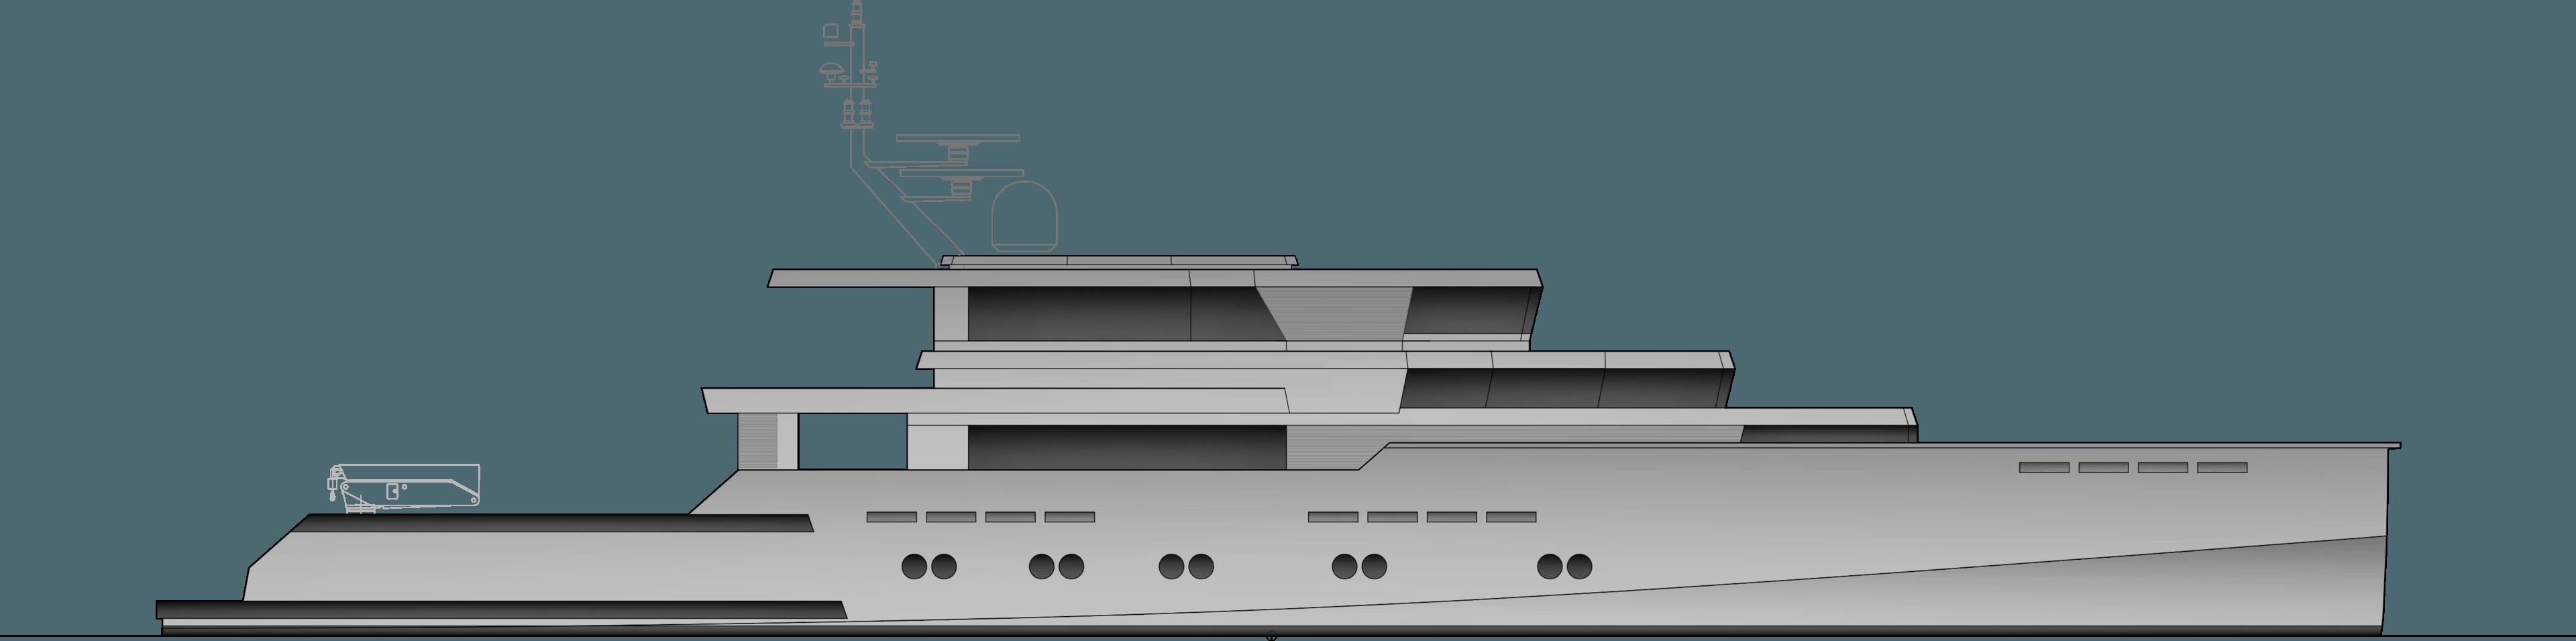 MMYD_063_45m Explorer Yacht GA_1_profile.png